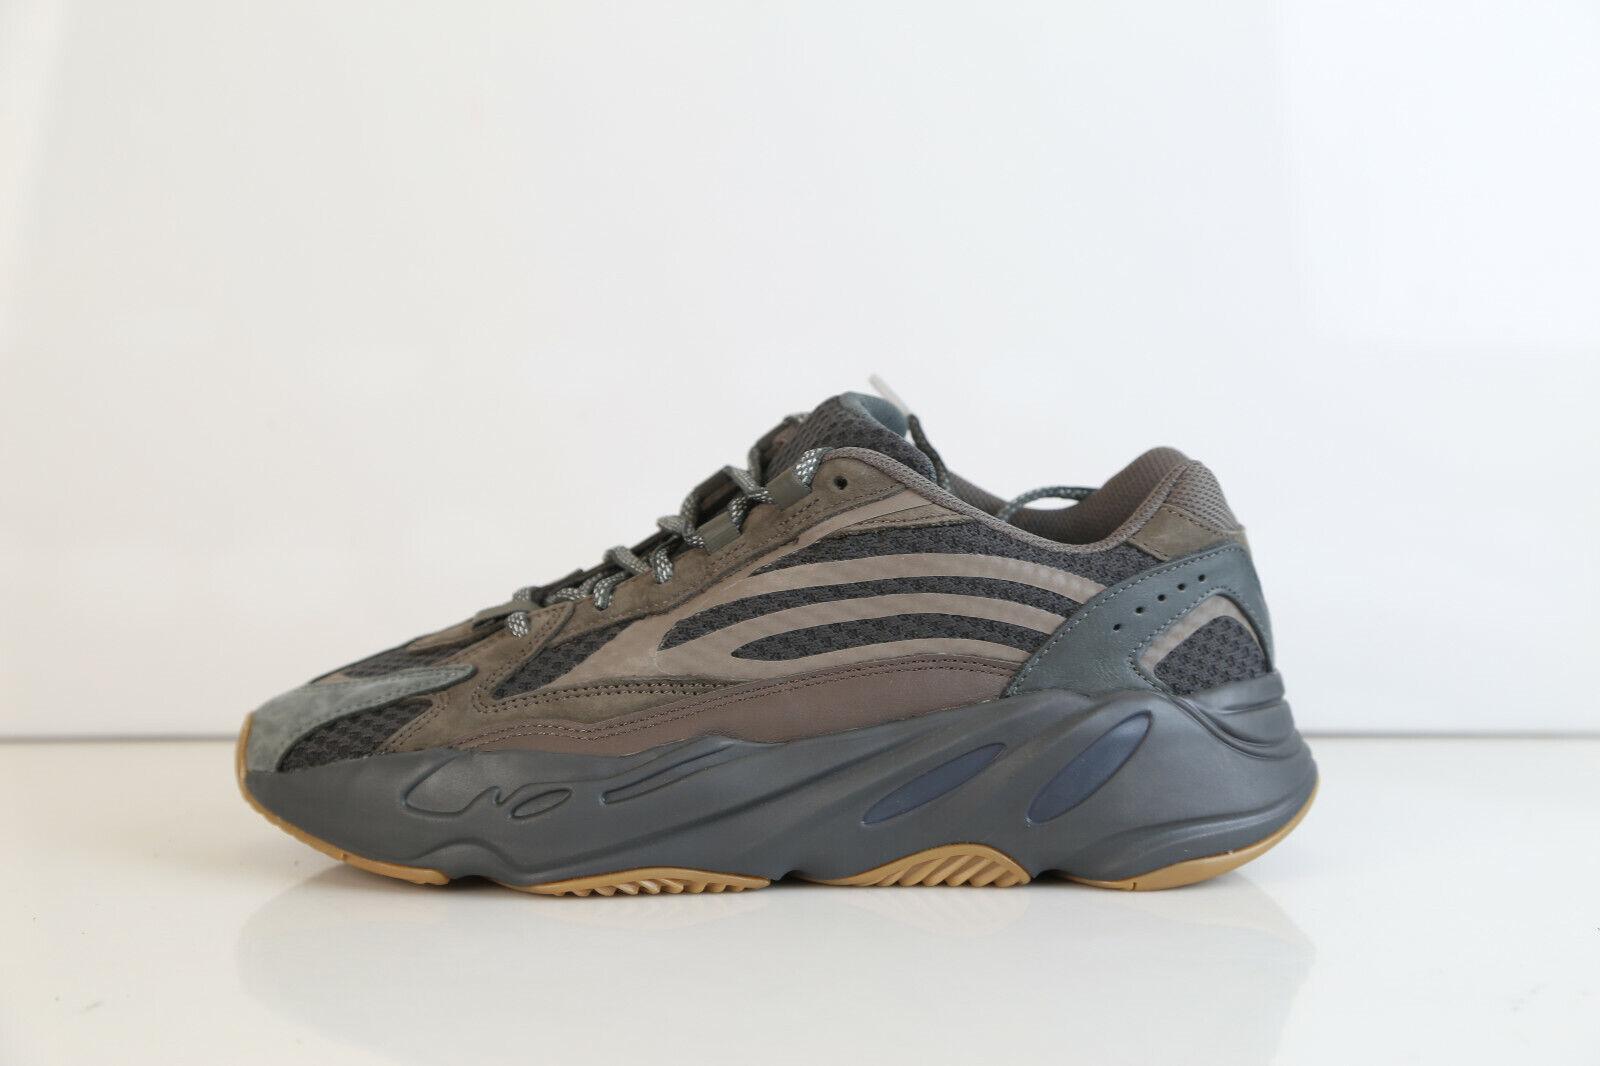 Adidas X Kanye West Yeezy Boost 700 V2 Geode EG6860 4-13 yzy